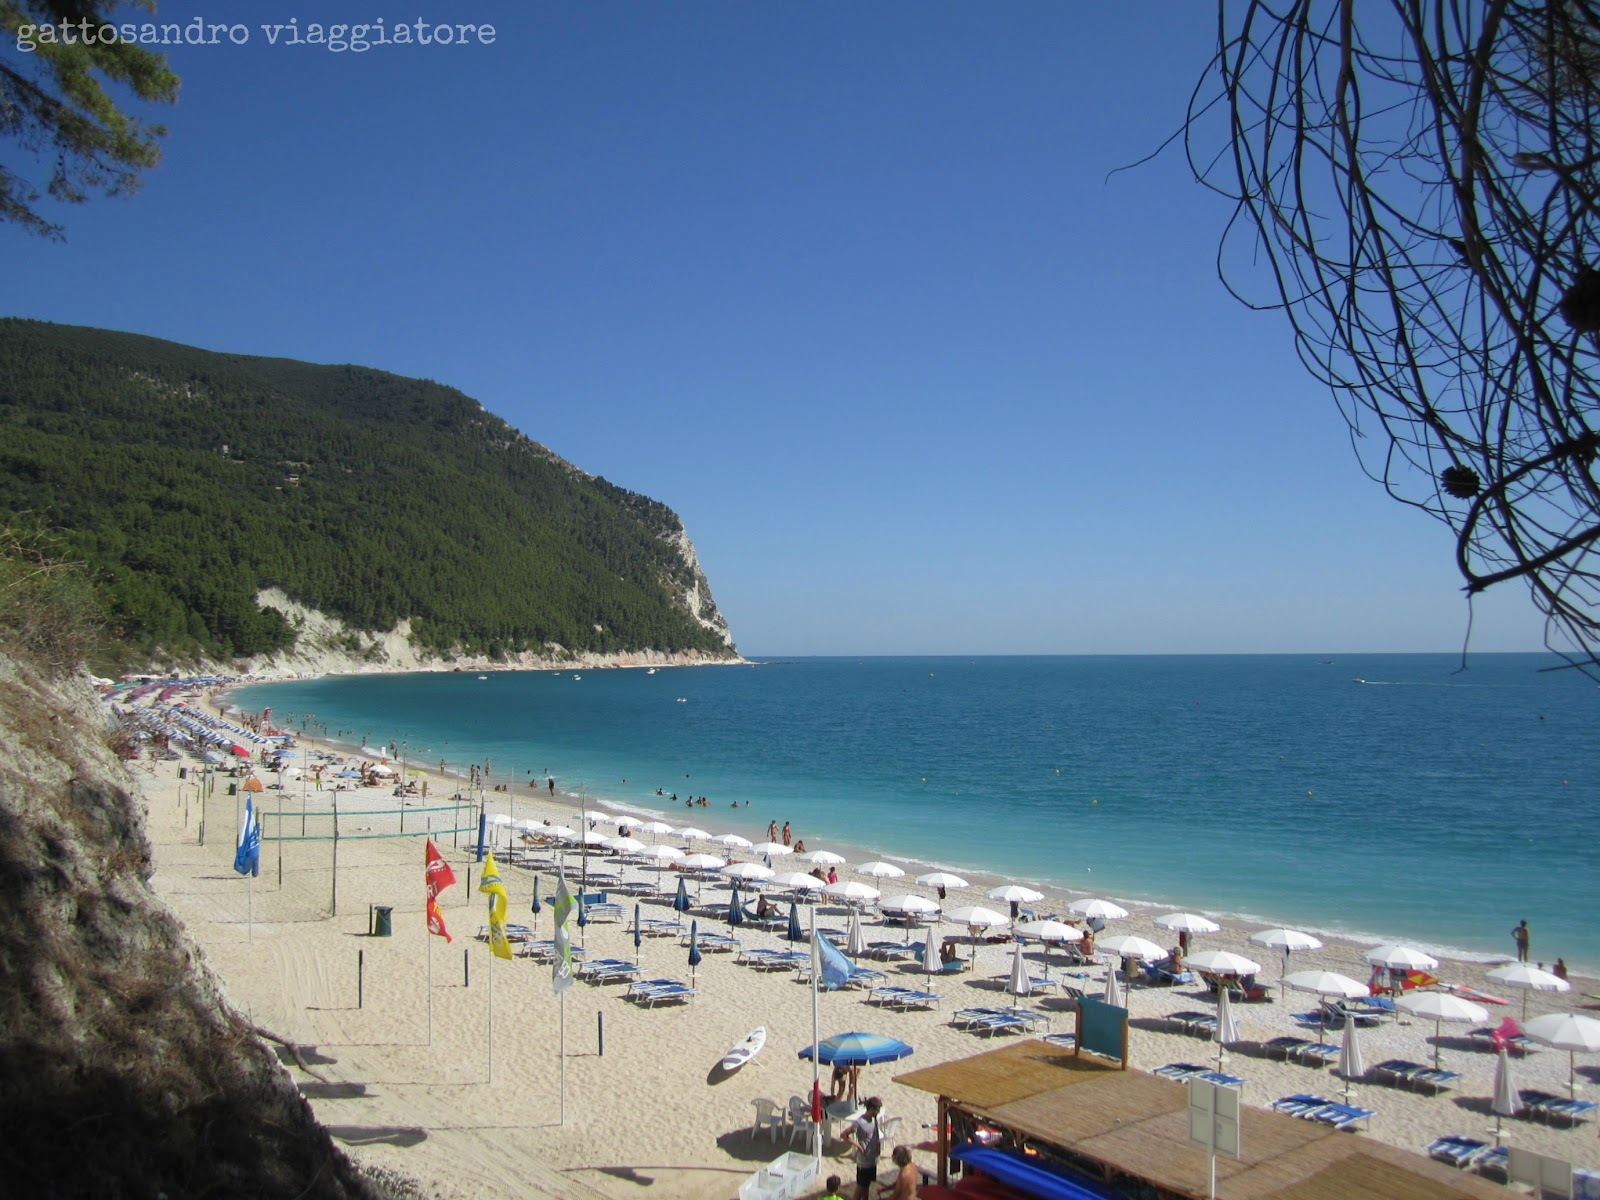 Gattosandro viaggiatore travel blog italia on the road - Piscina falconara marittima ...